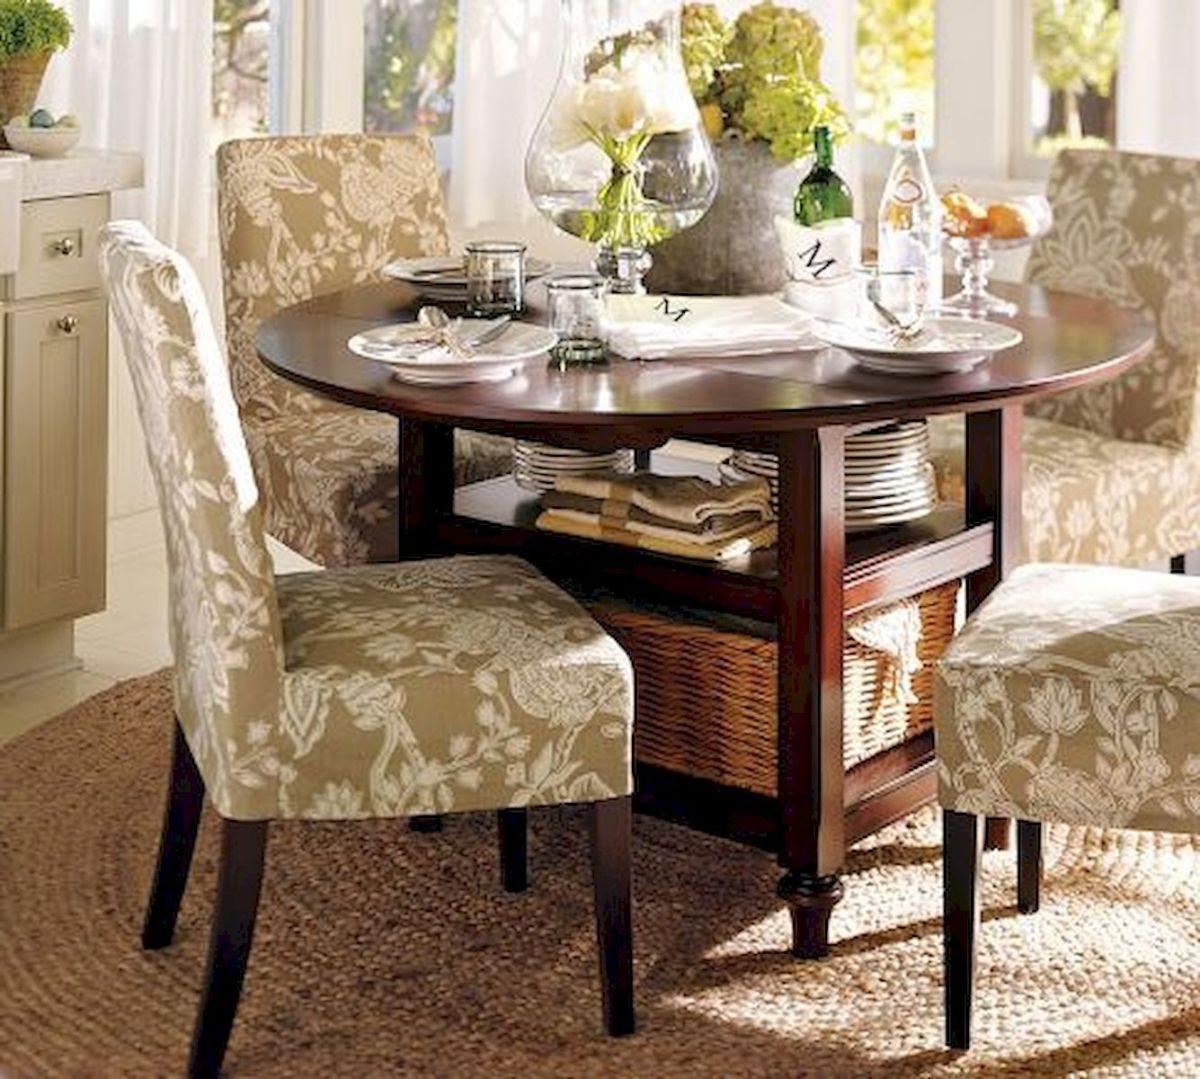 80 Elegant Modern Dining Room Design and Decor Ideas (19)